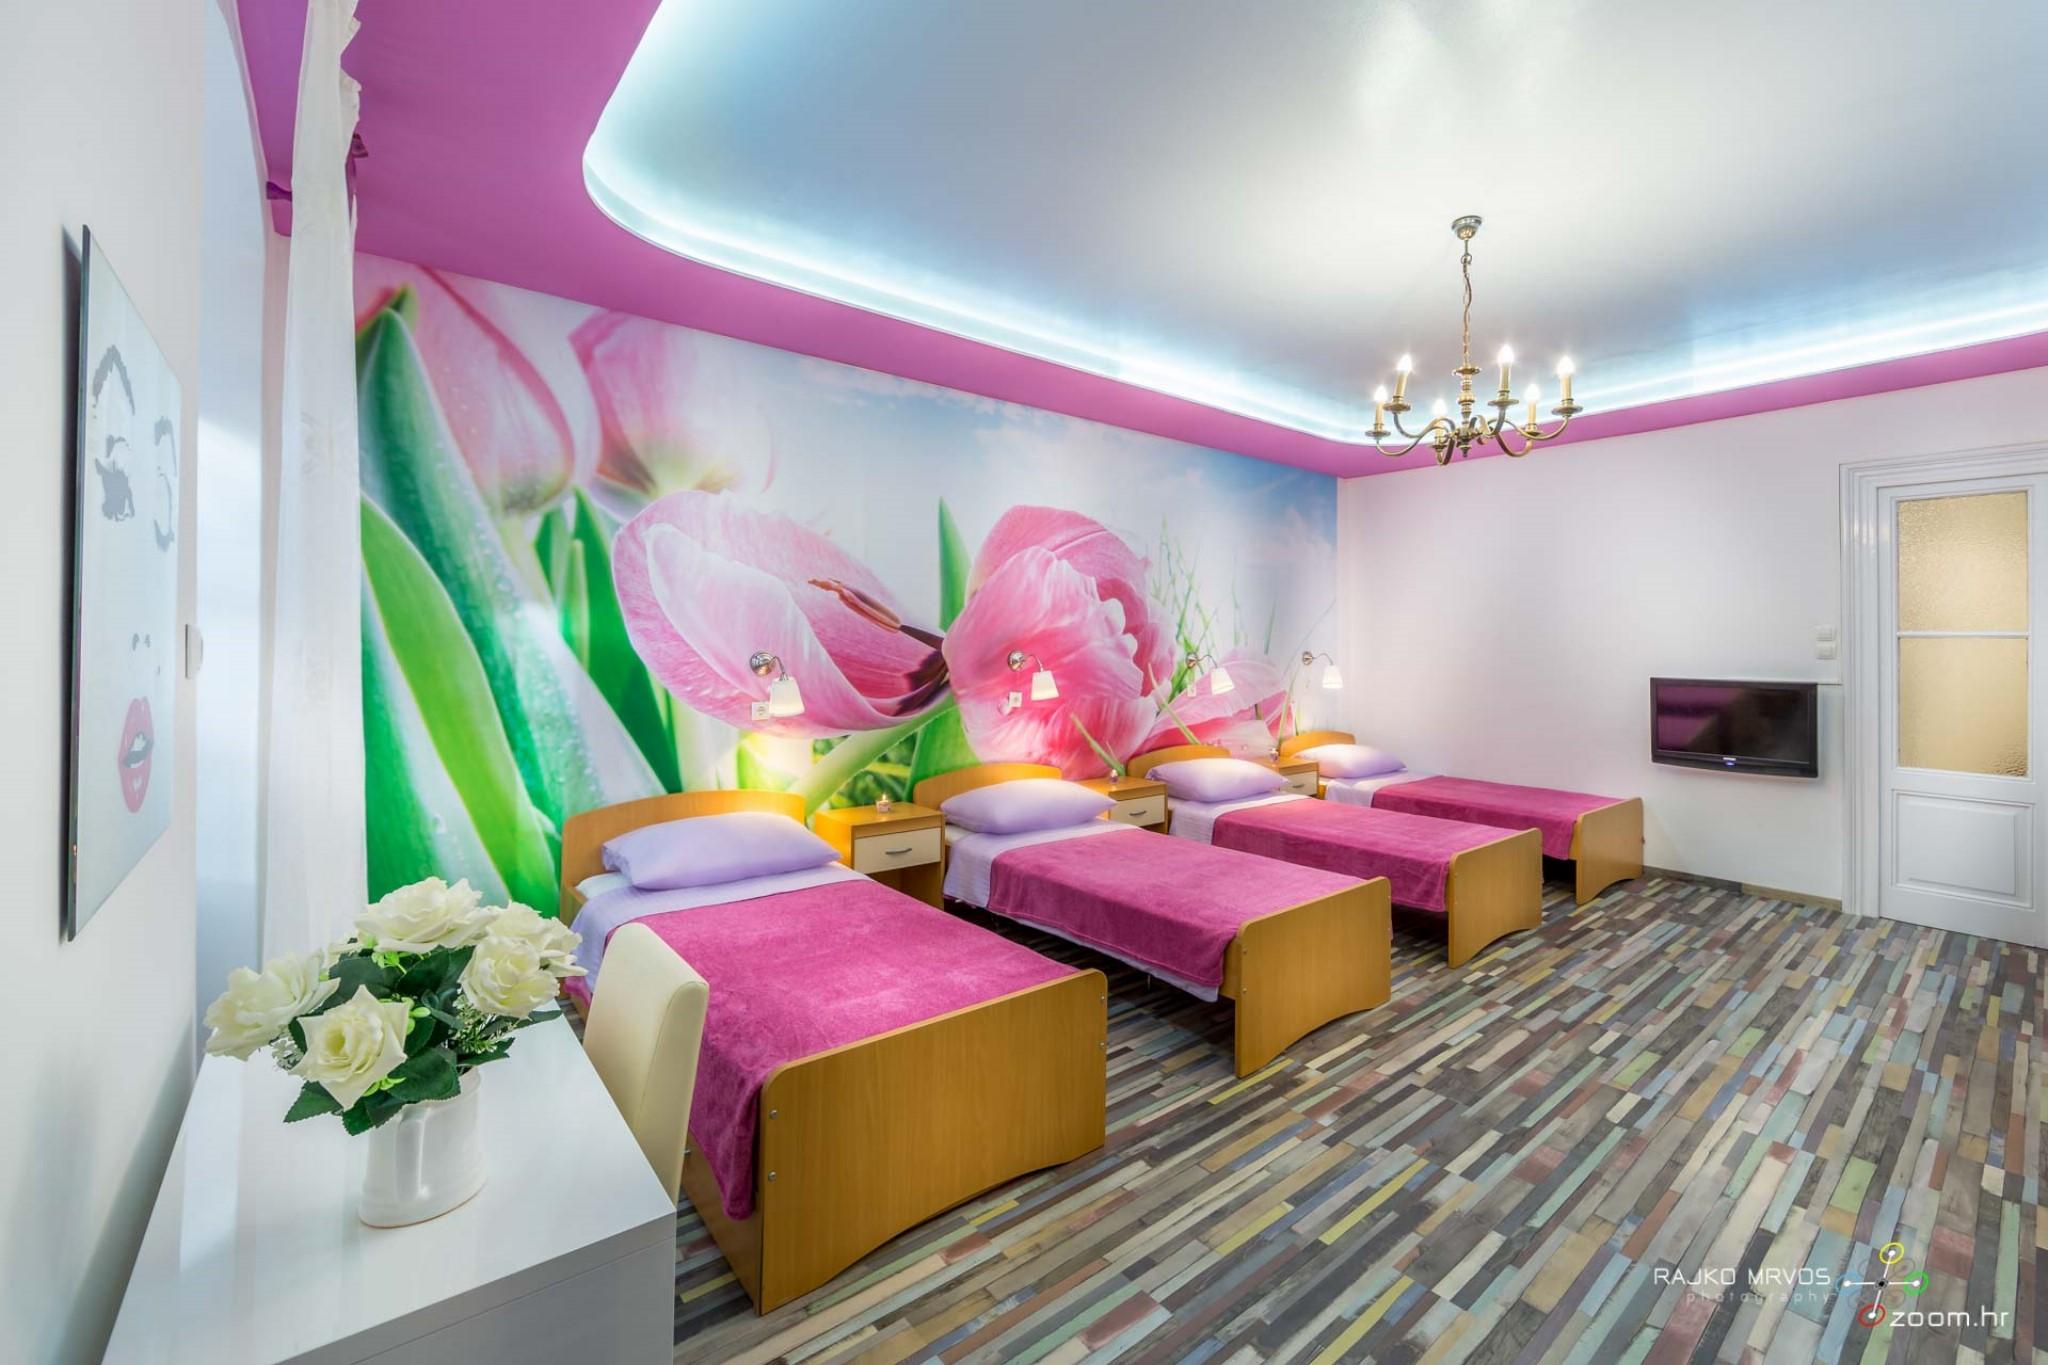 fotografiranje-interijera-fotograf-eksterijera-apartmana-vila-kuca-hostela-Happy-Hostel-4